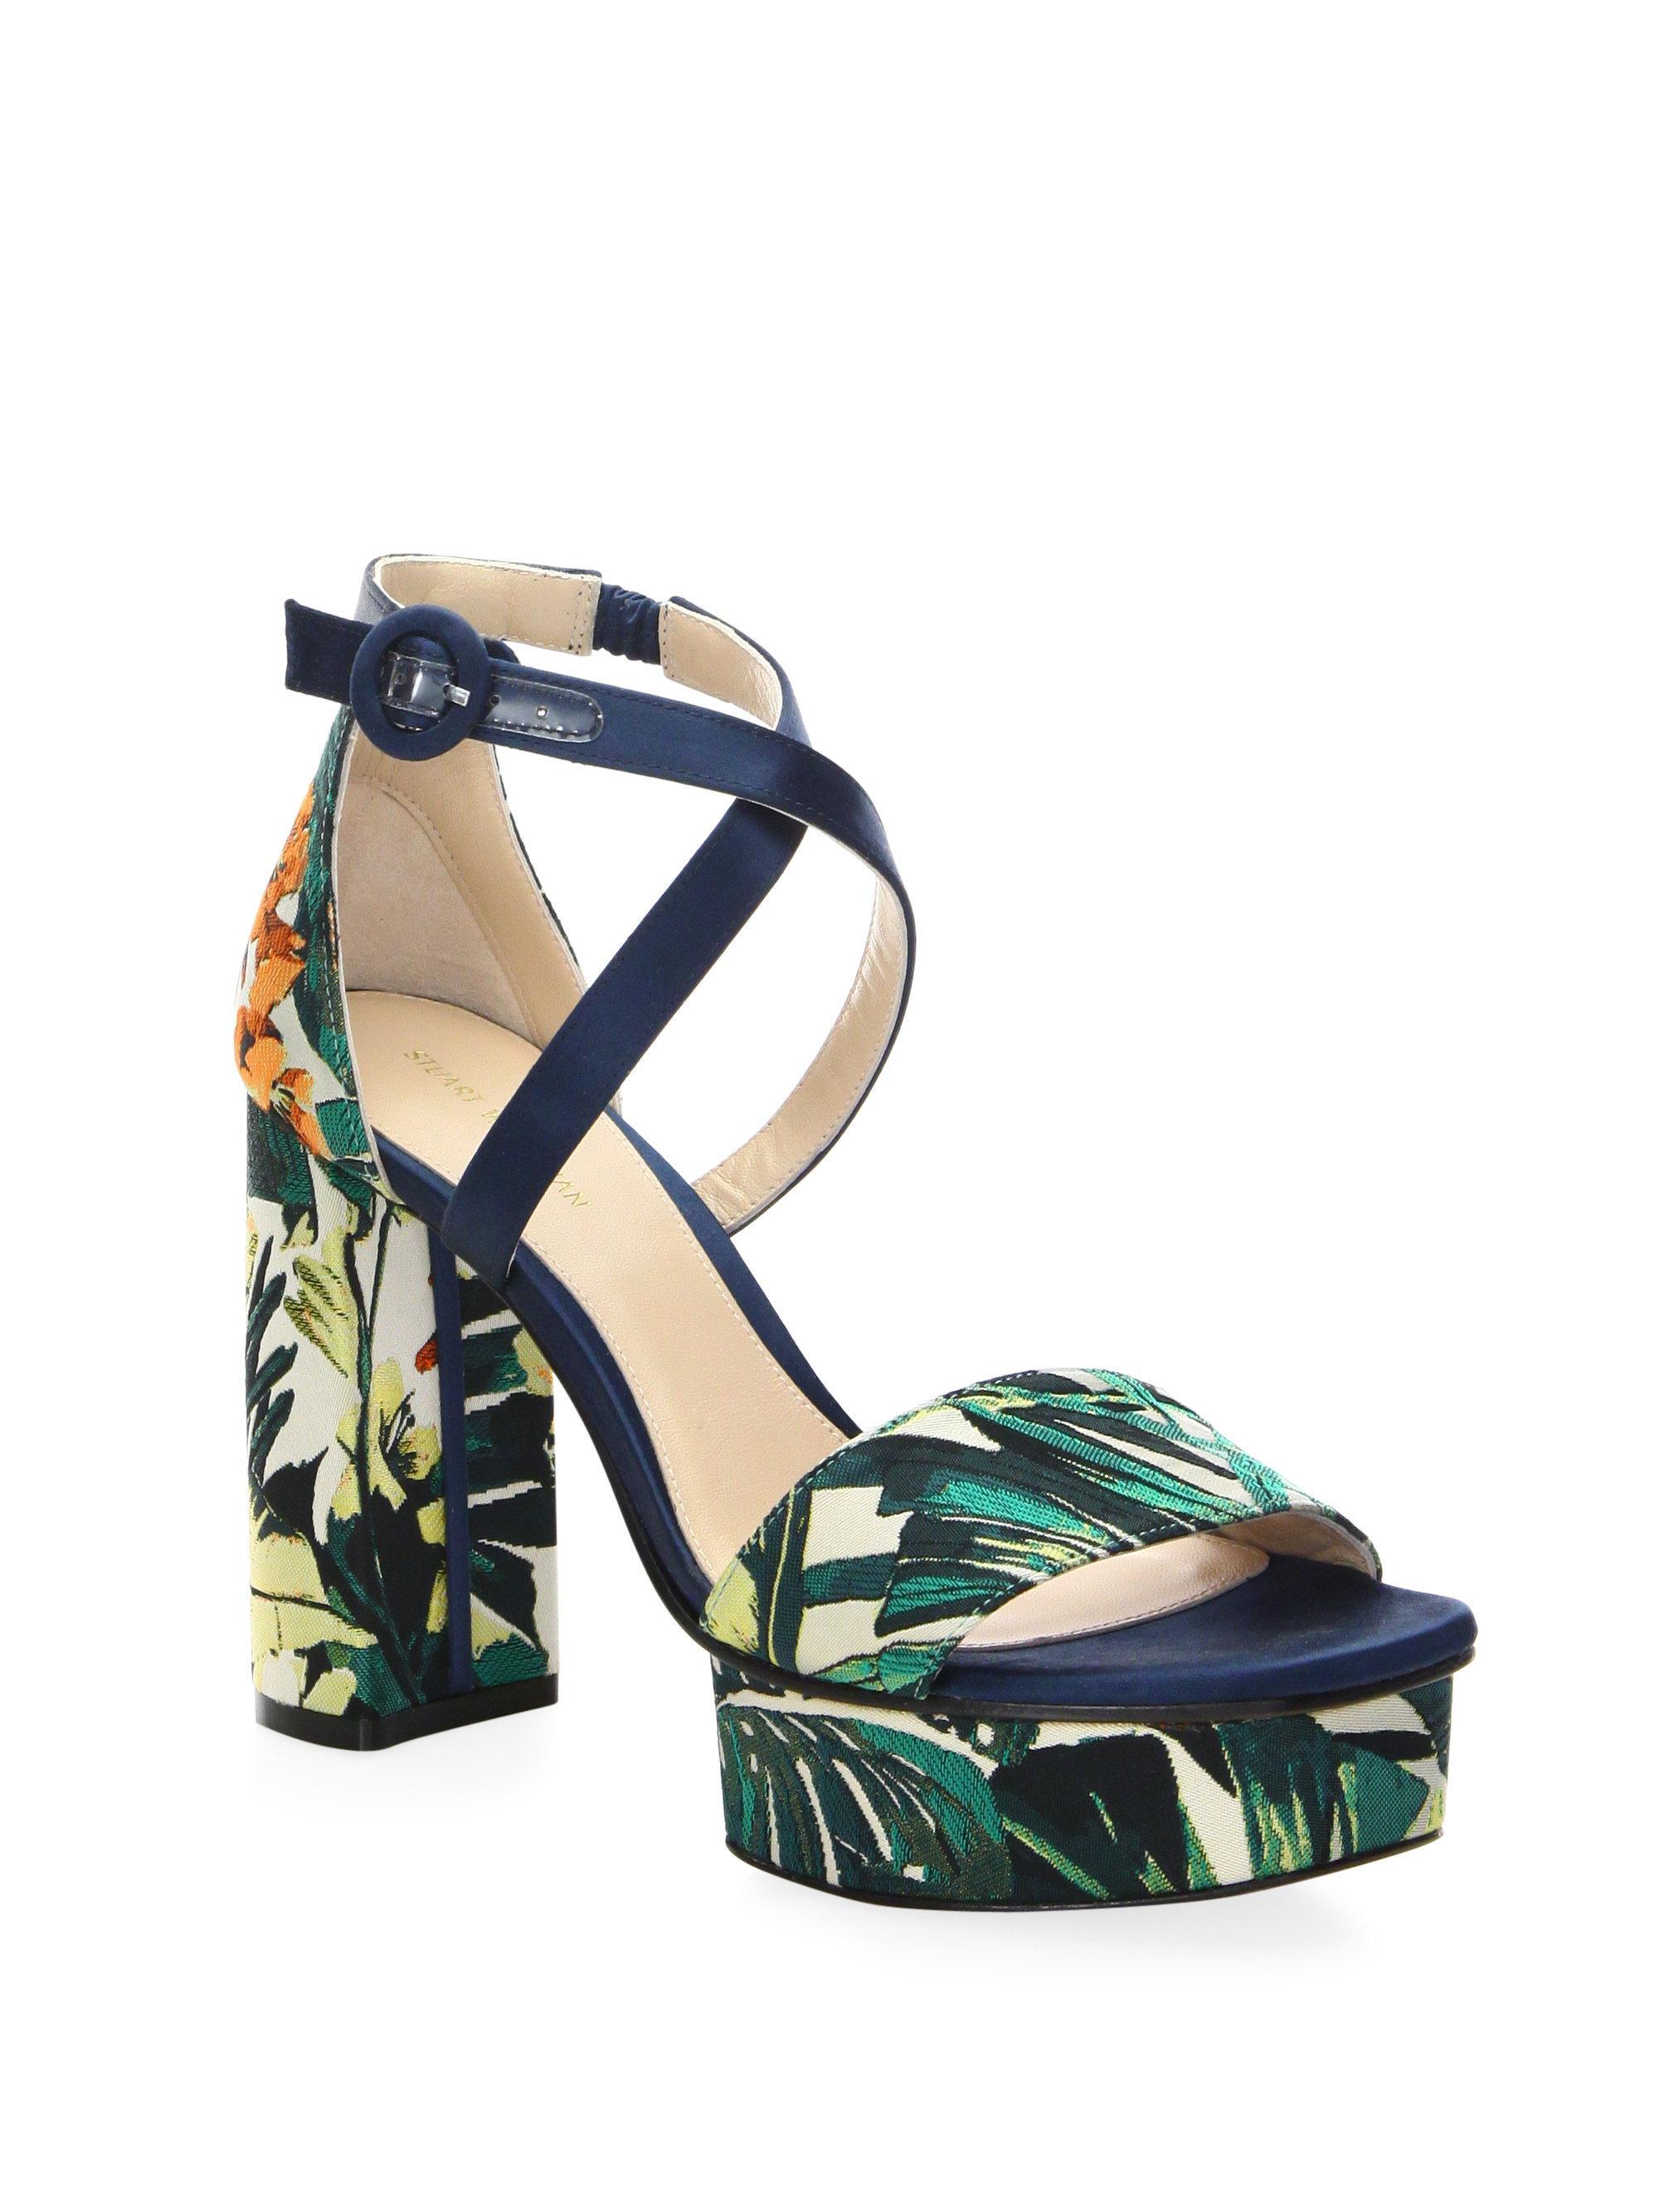 Stuart Weitzman Carla Platform Sandals pRIir